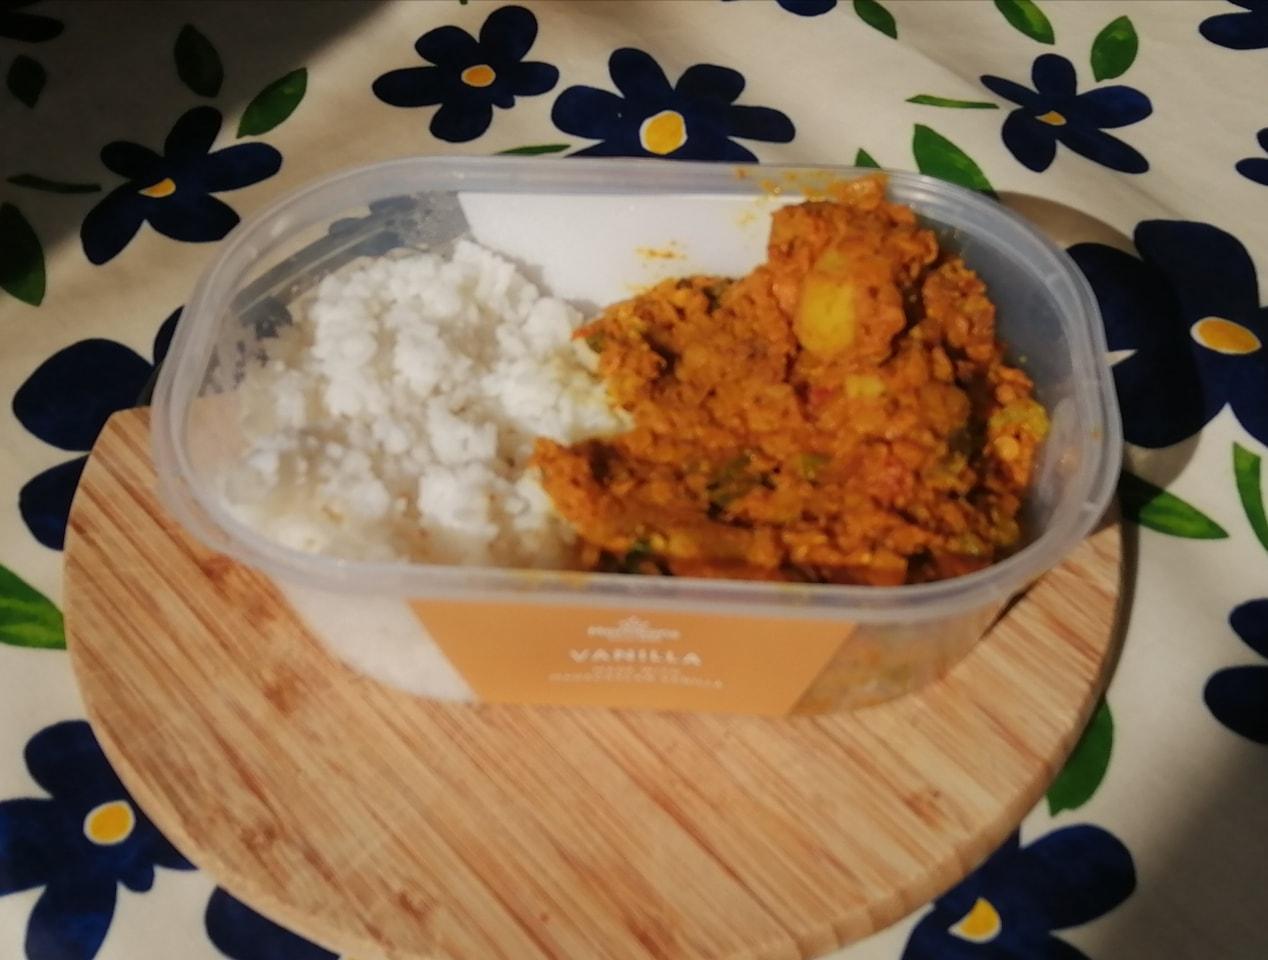 Veggie lentil Dahl style - with rice